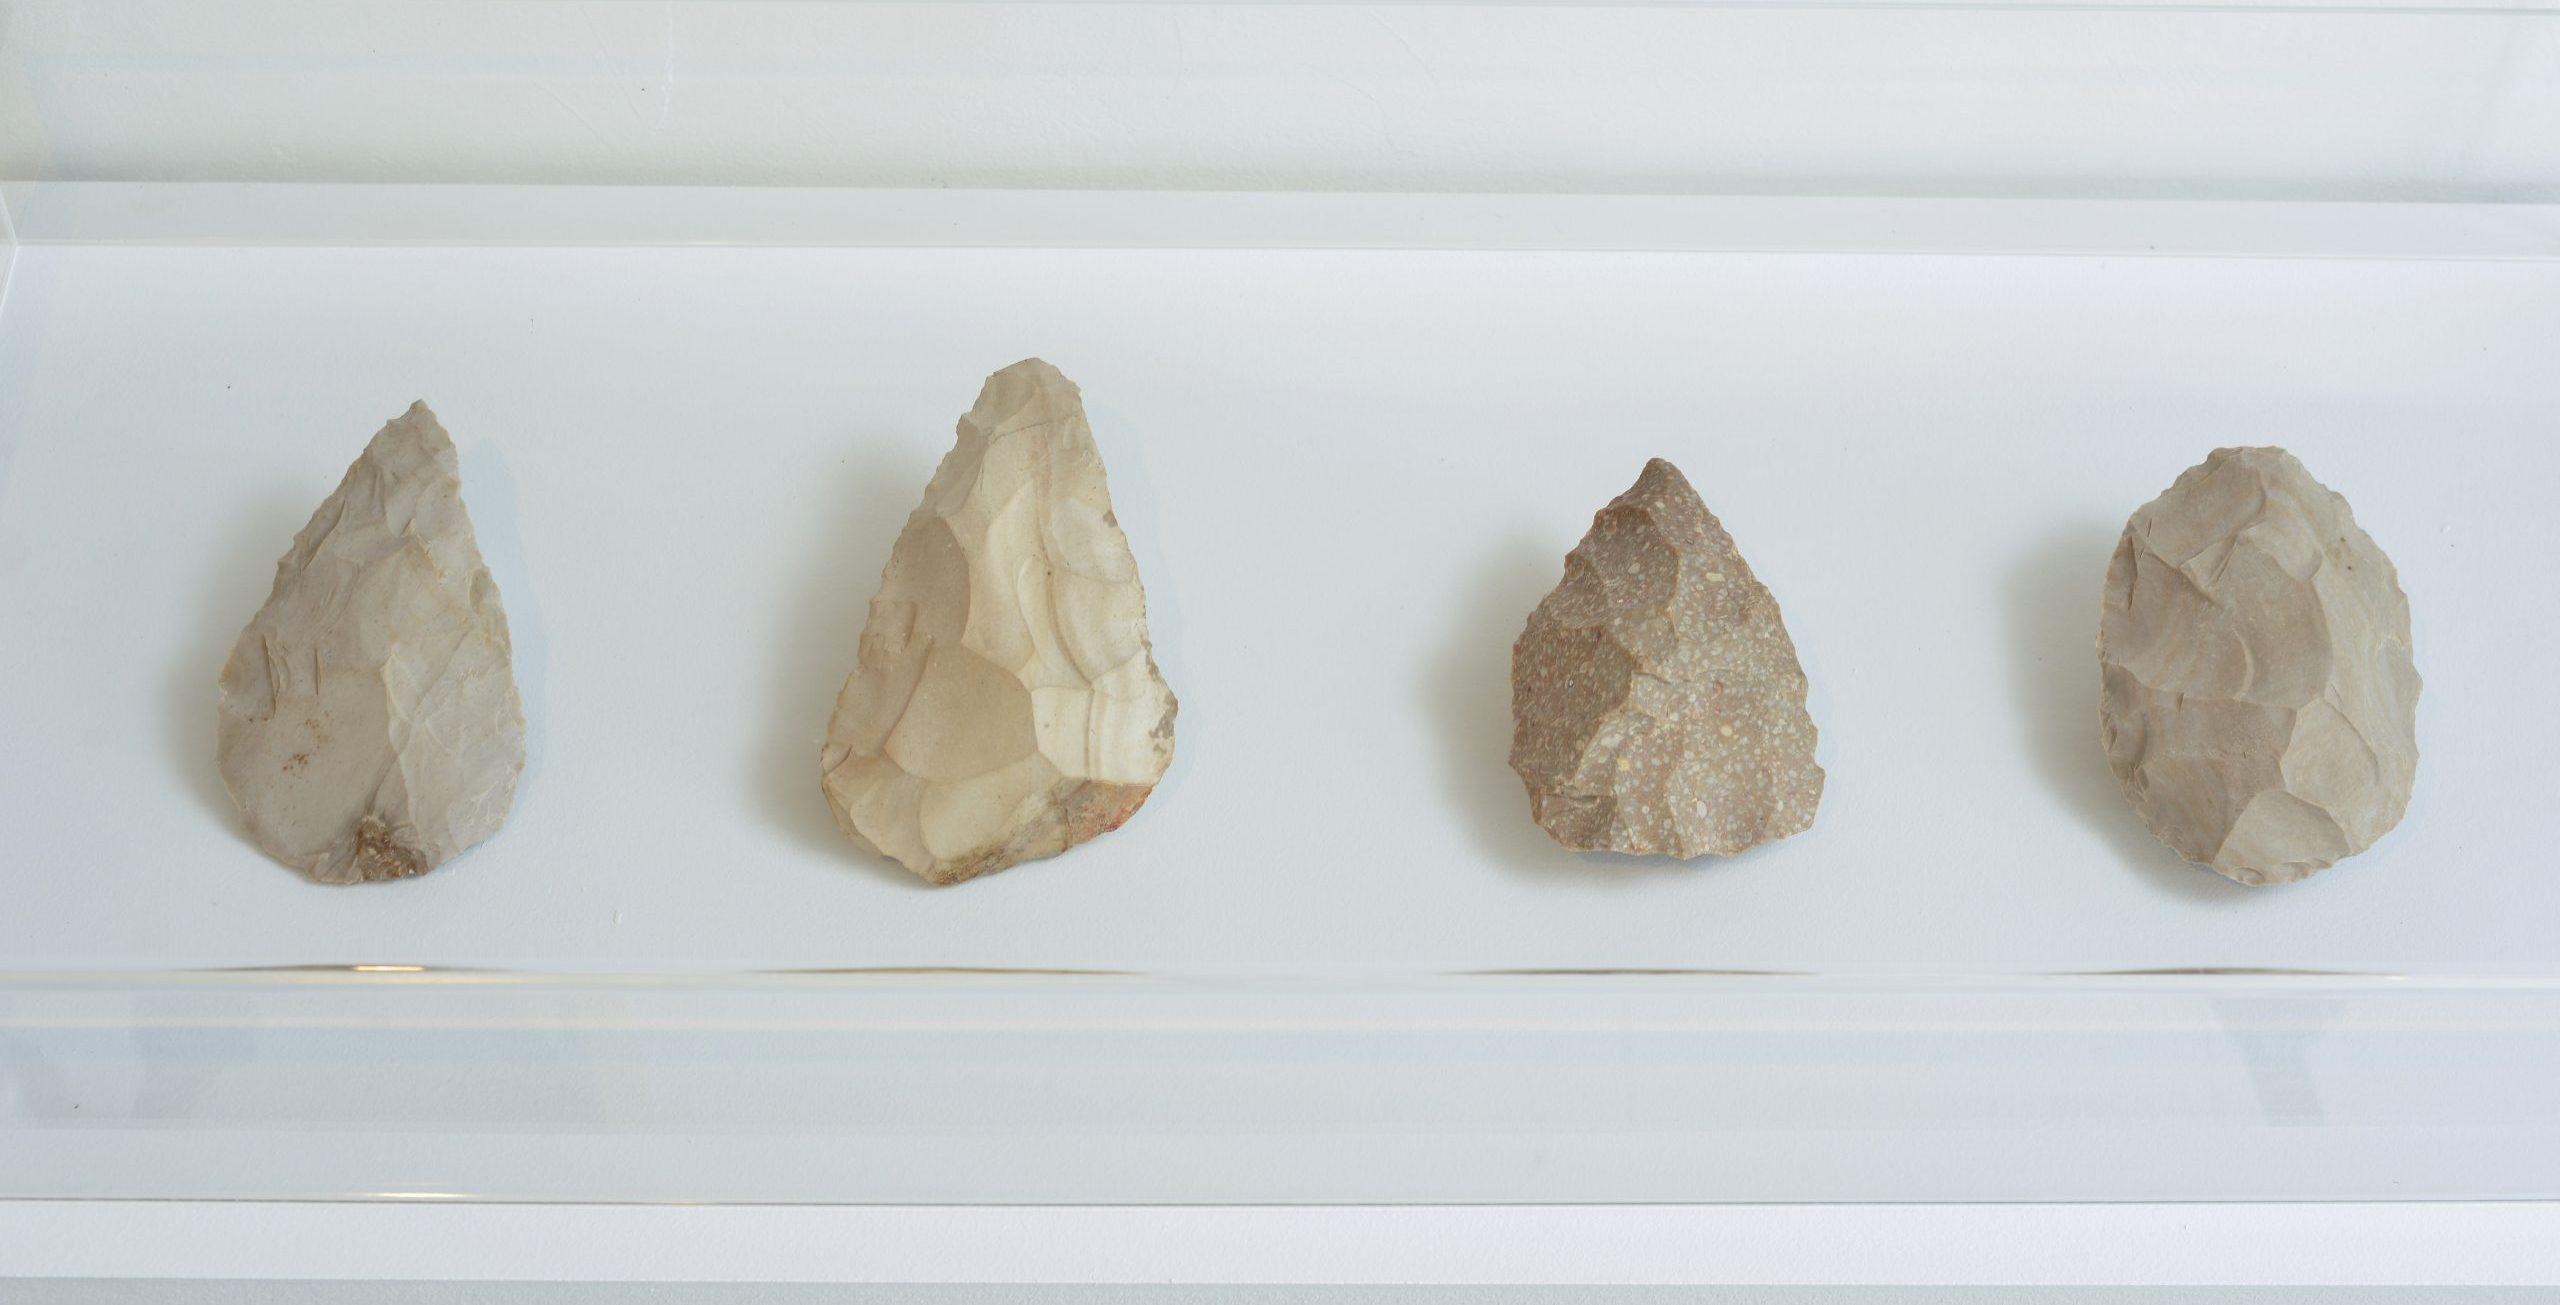 אבן על אבן | גדי הרצלינגר